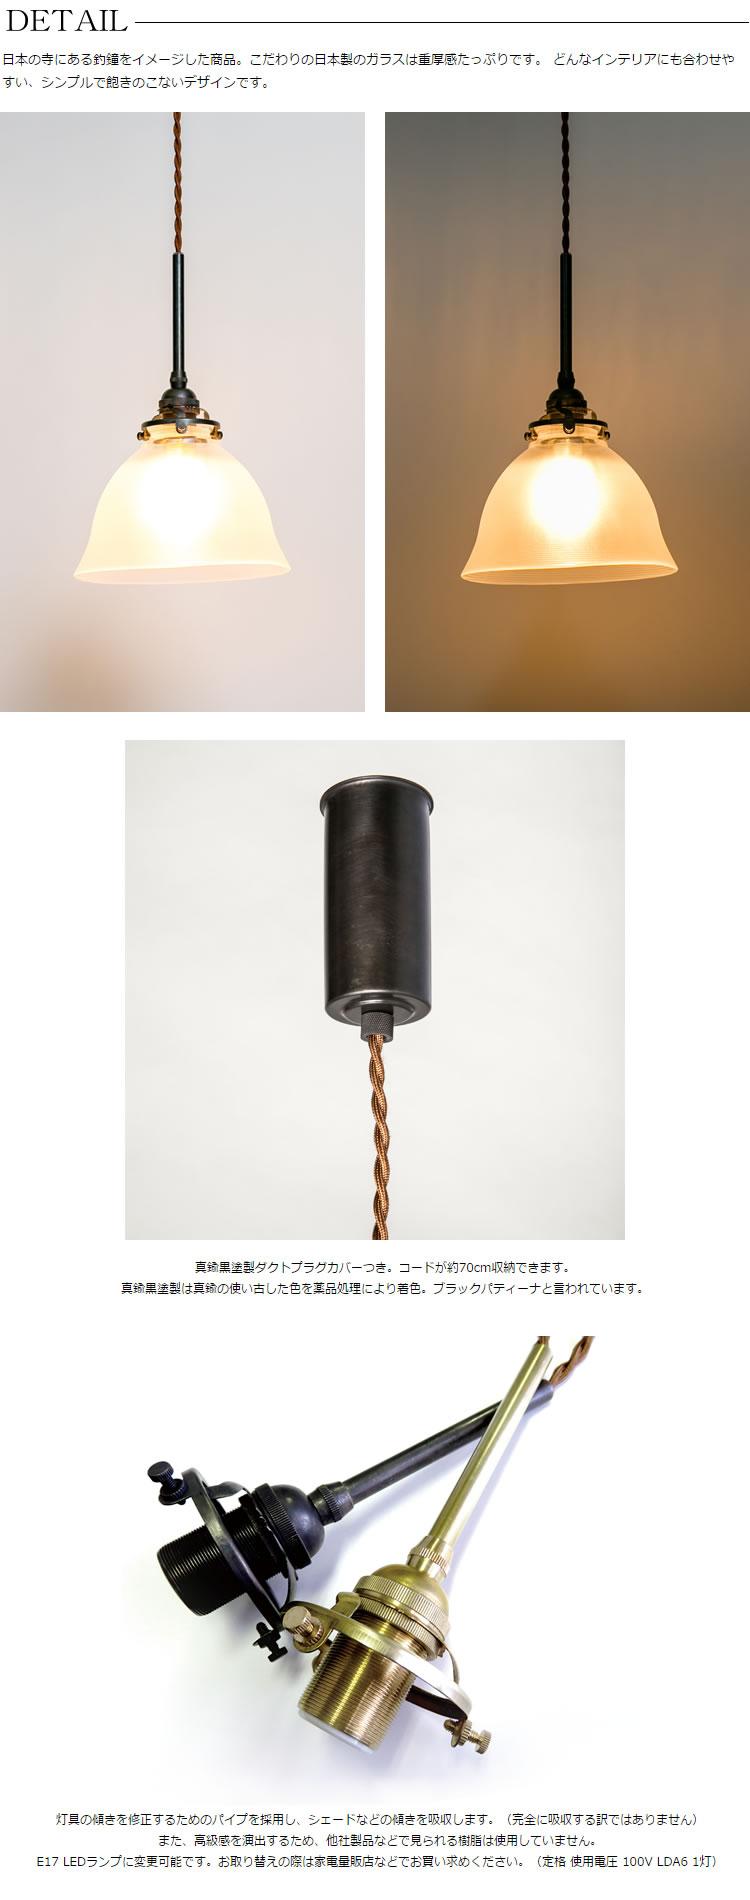 TSURIGANE(ガラス消し・ダクト・真鍮黒染)